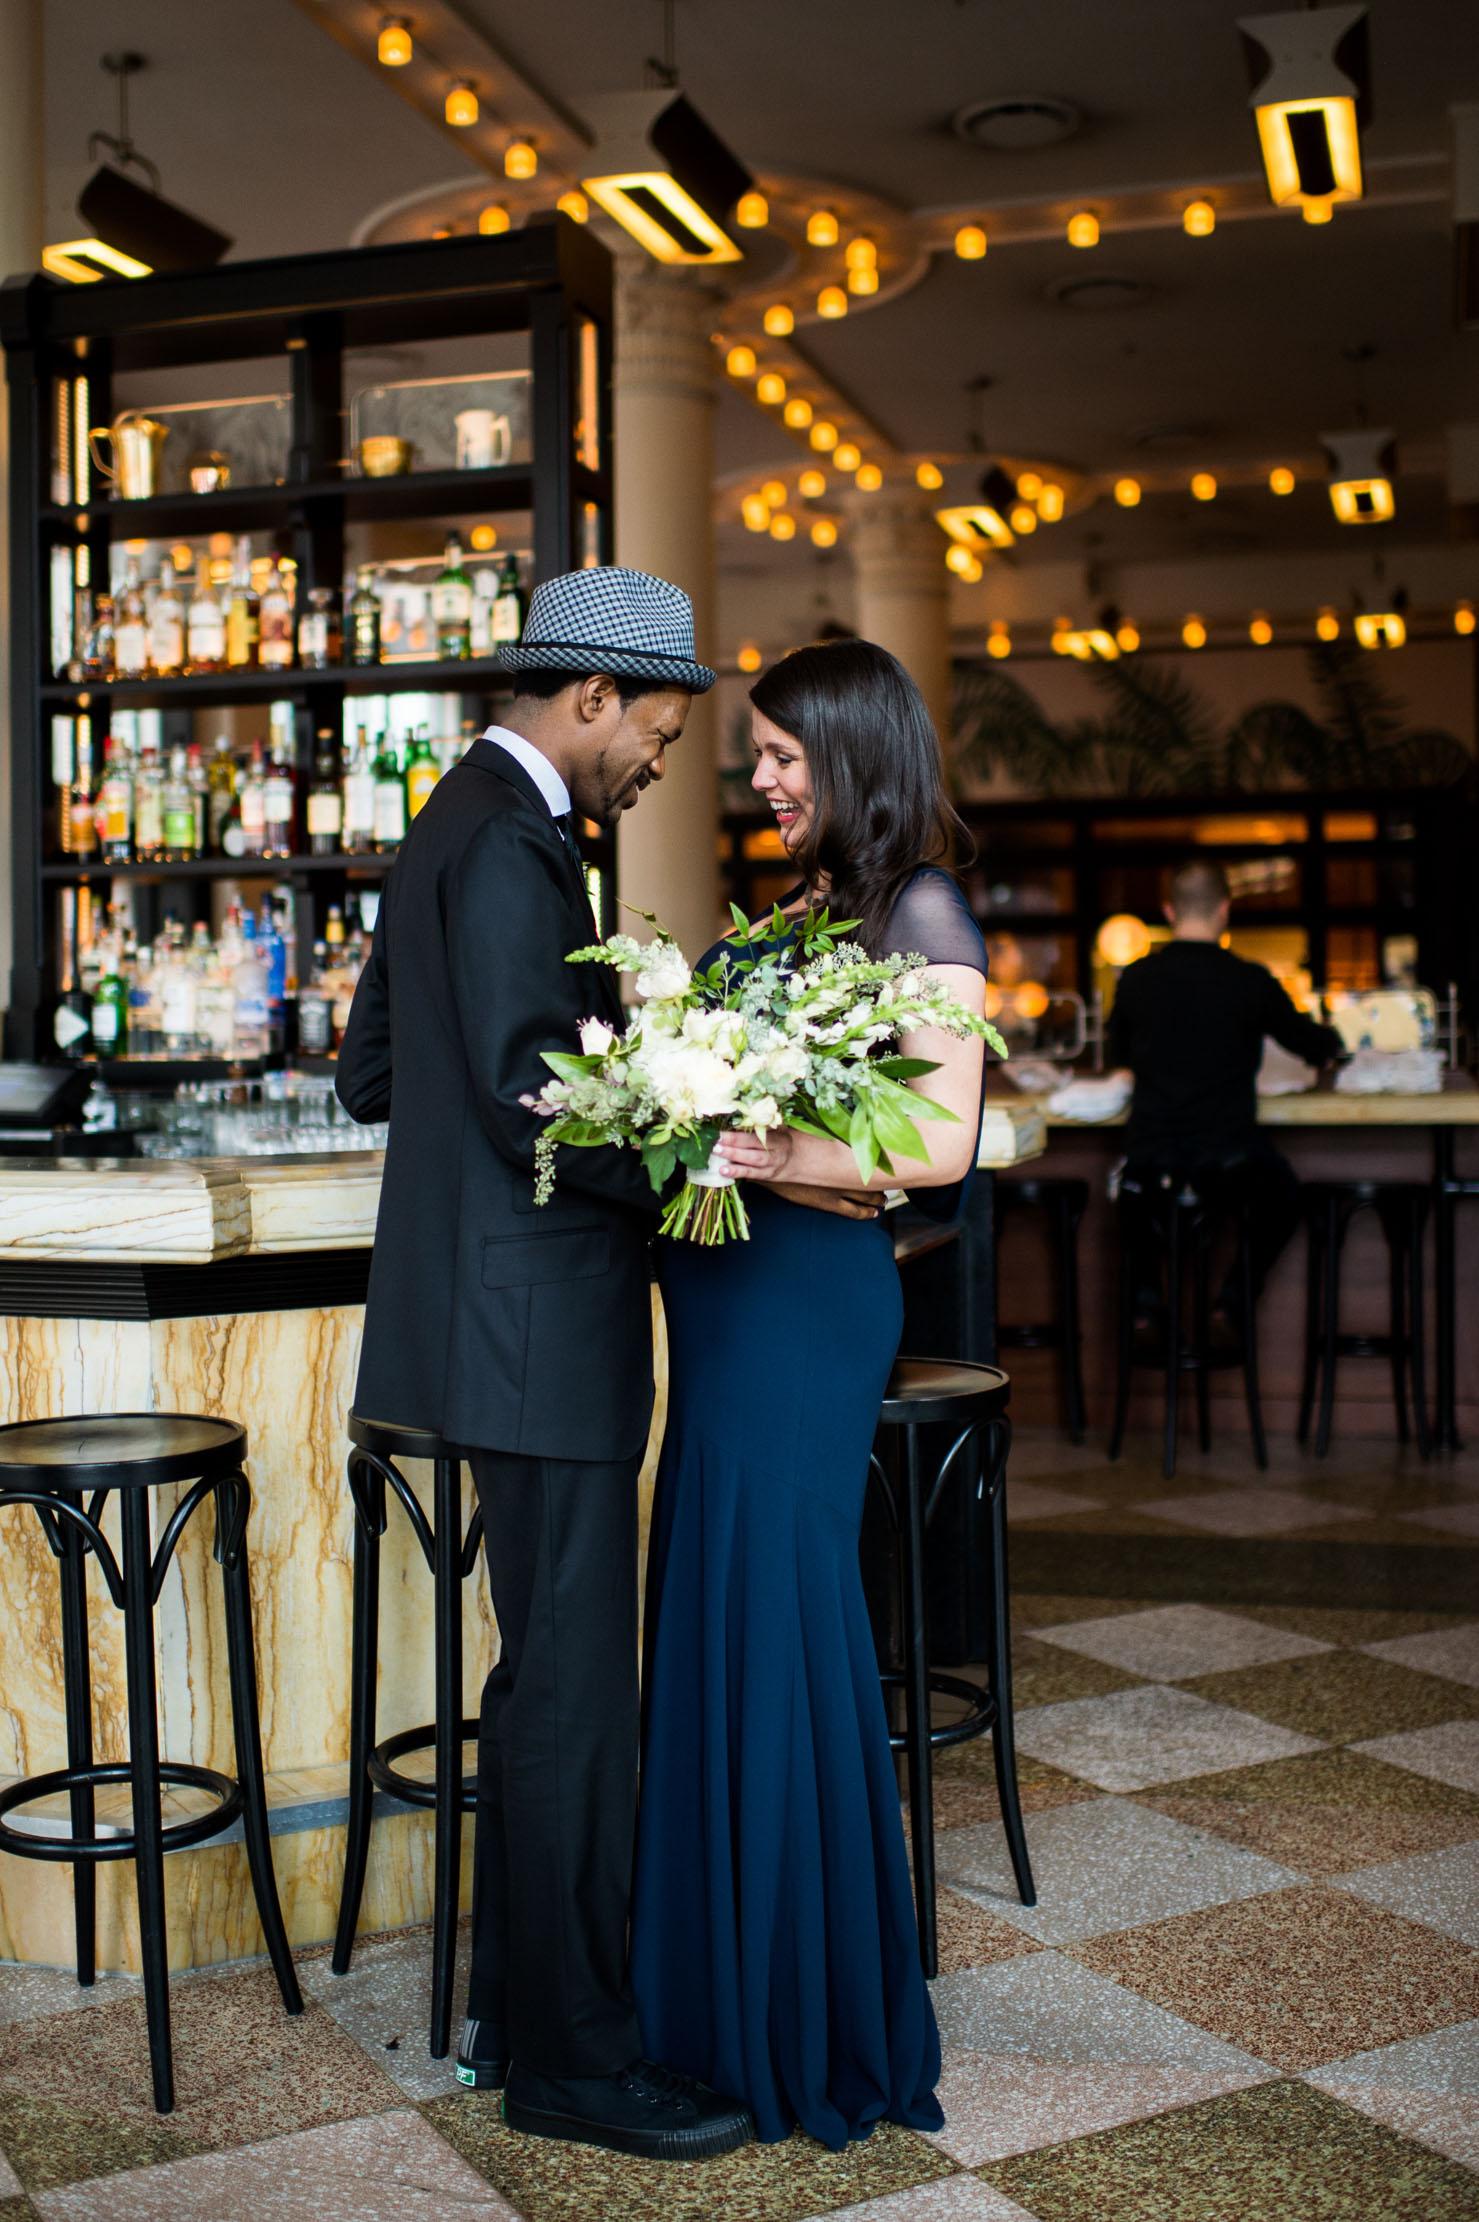 NOLA-Felicity-Church-Ace-Hotel-Wedding-1021.jpg